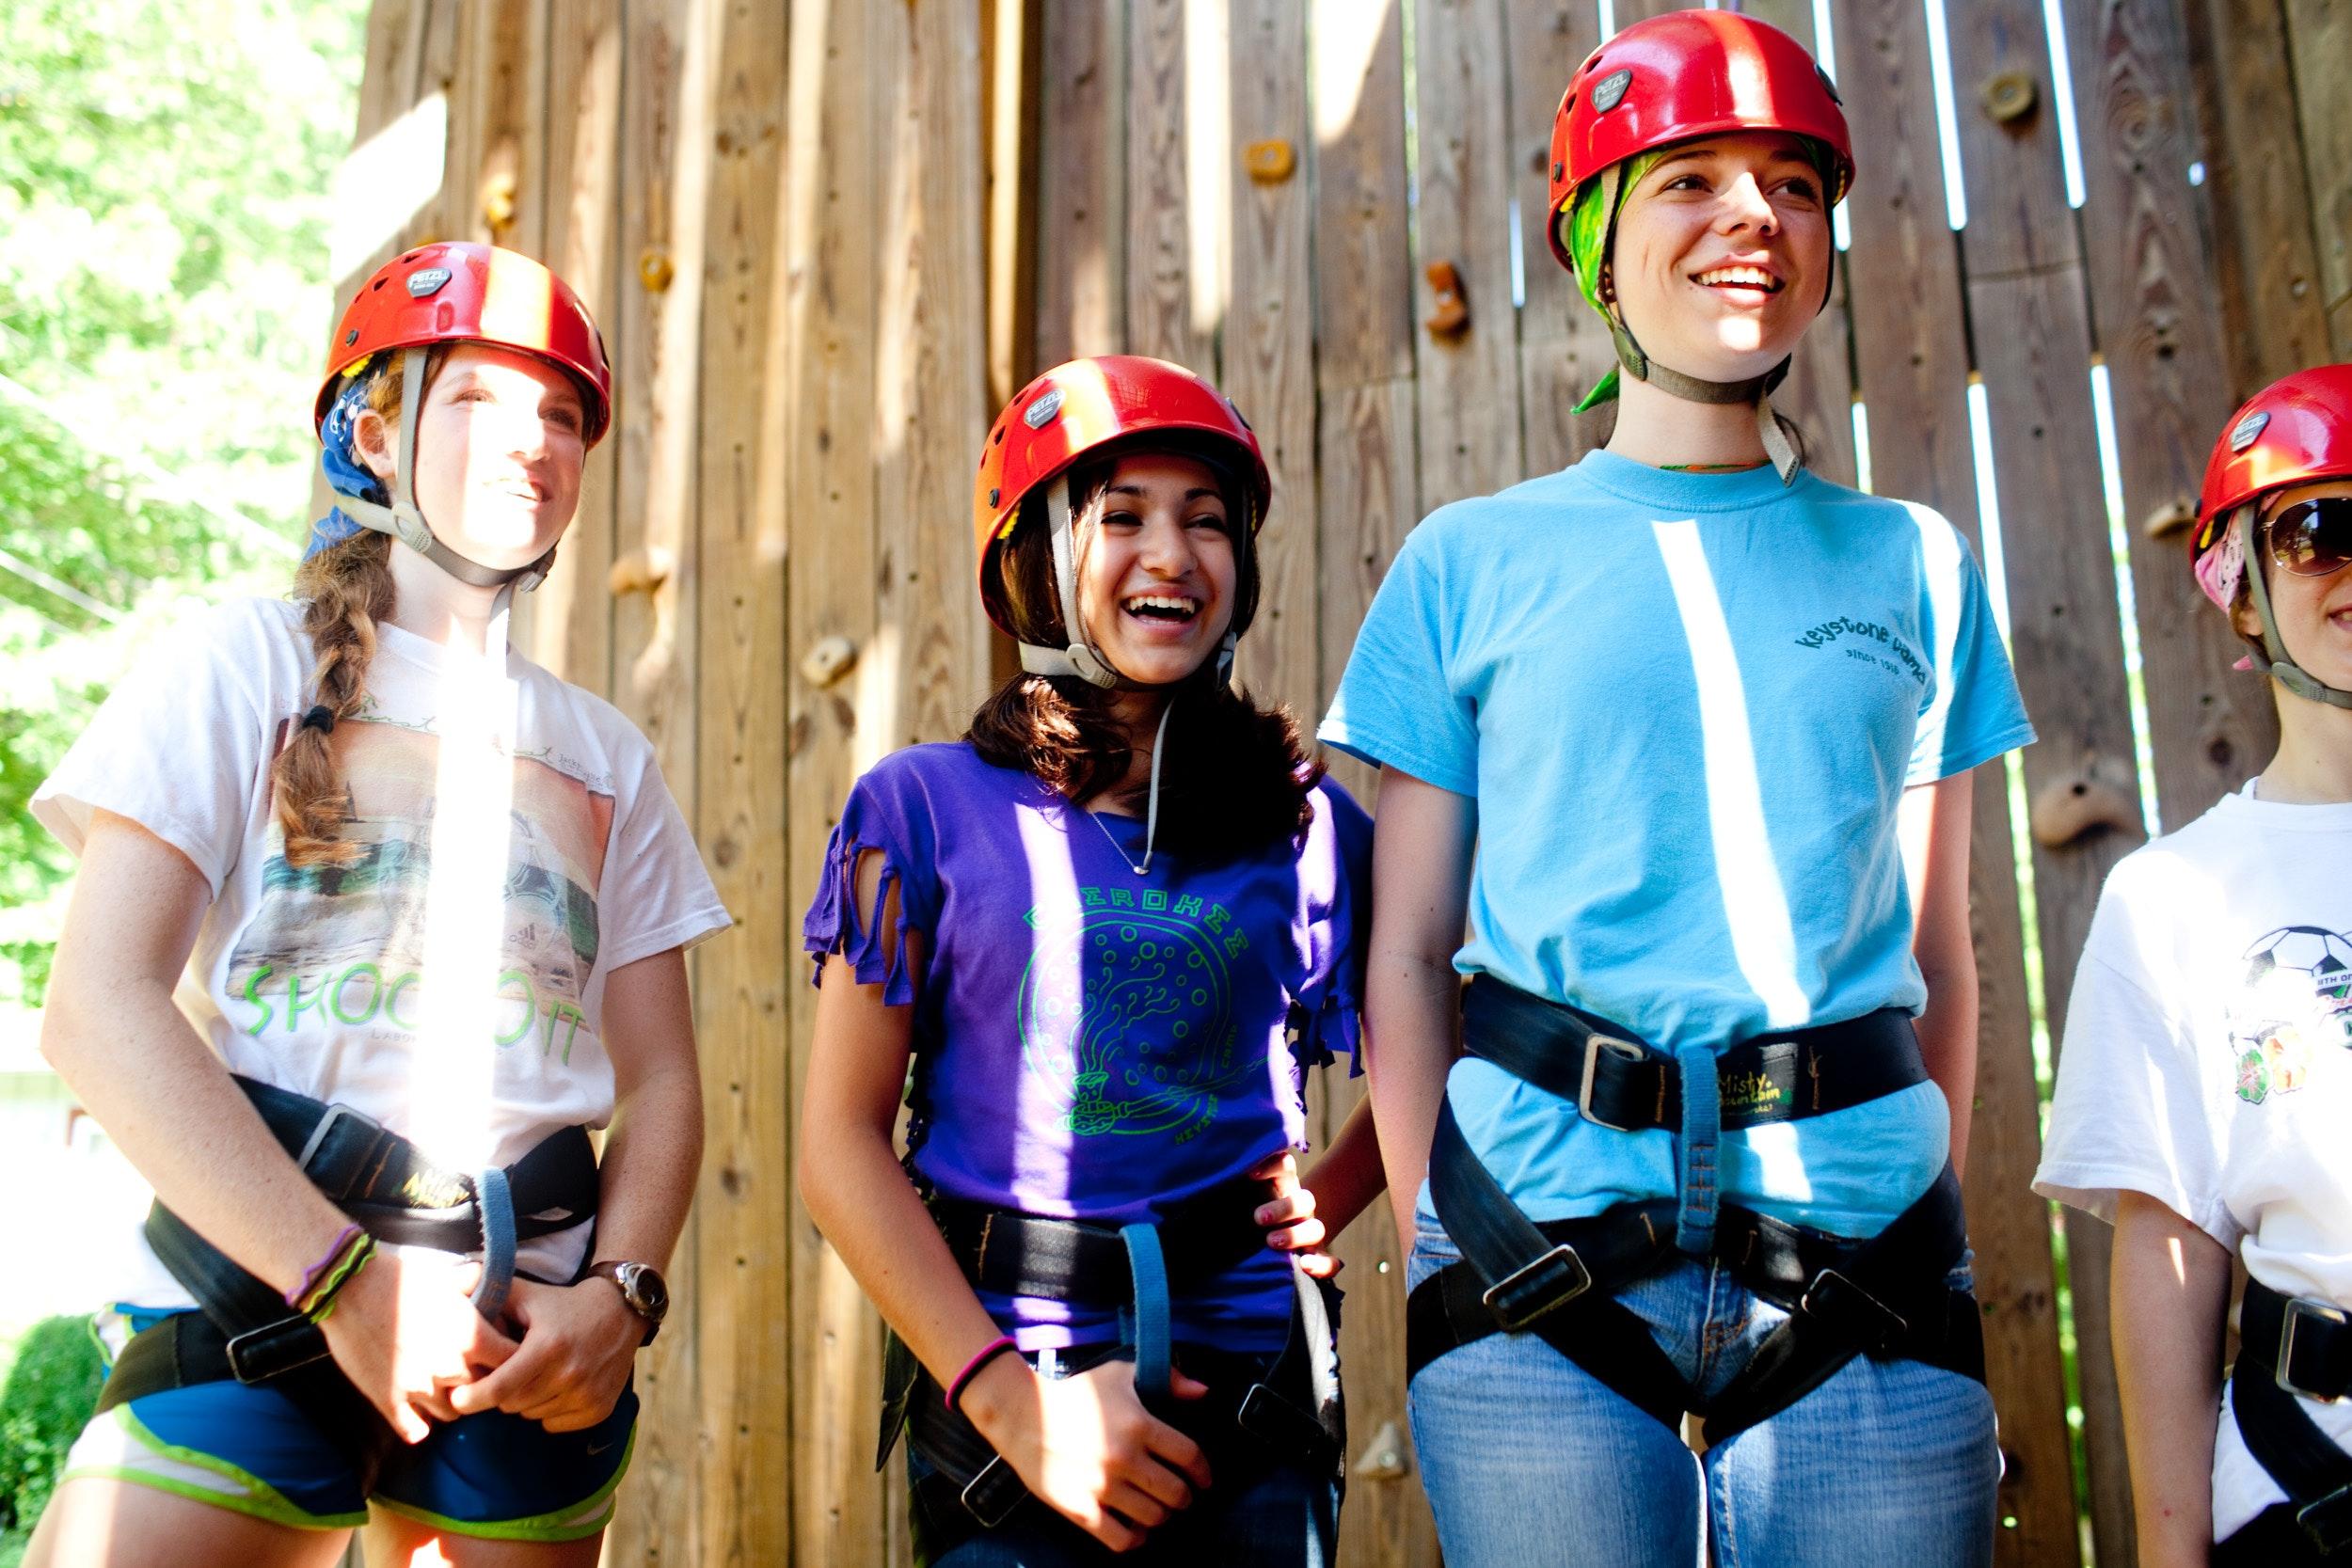 Tips from parents at keystone summer camp for girls in north carolina.jpg?ixlib=rails 2.1